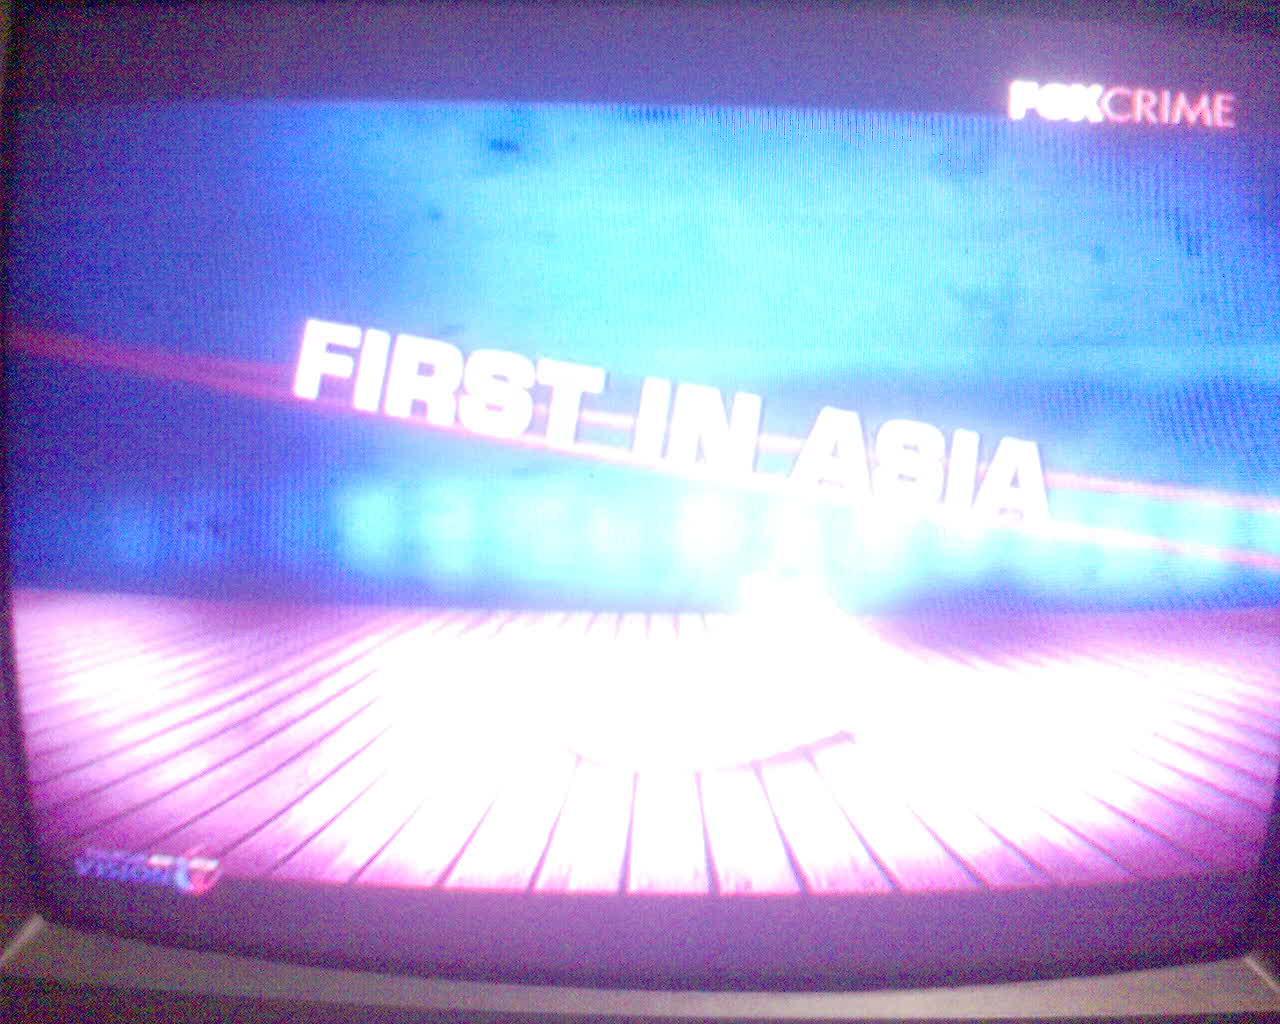 ... kappa tv mazhavil bet365 0 free bet arsenal v liverpool odds junkie manorama suryatv we tv channel yes indiavision